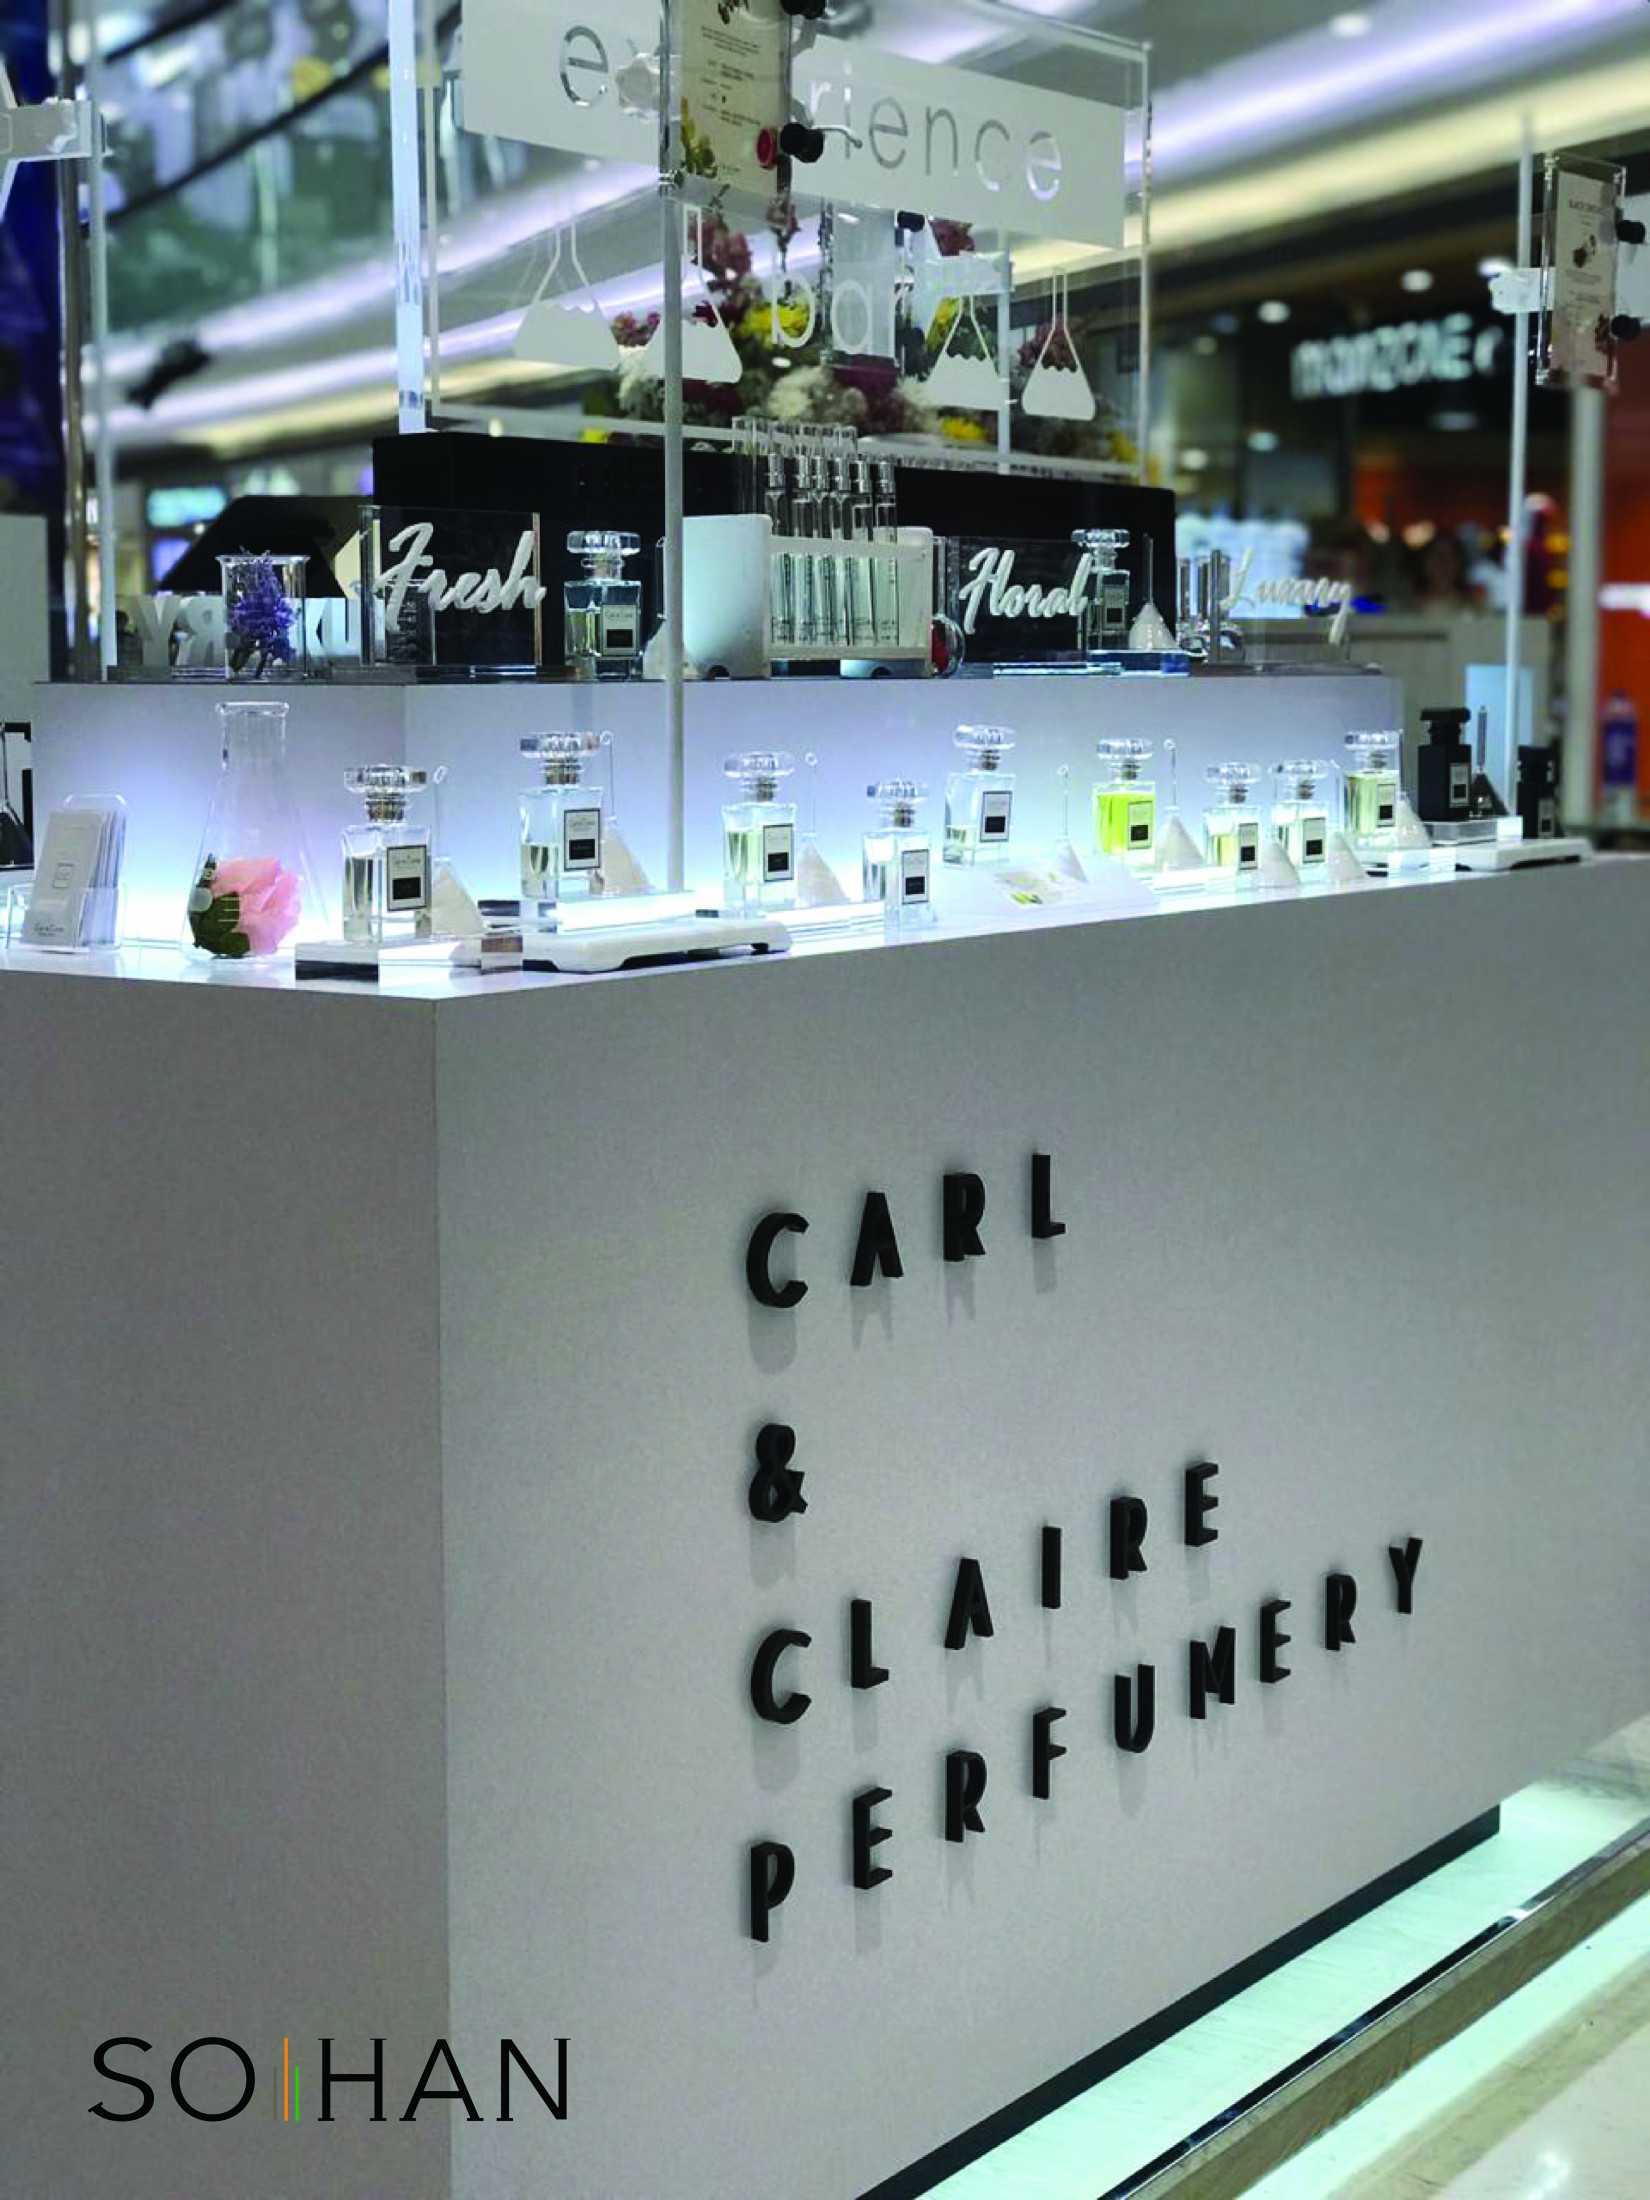 Sohan Interior Commercial Carl & Claire Booth Jakarta, Daerah Khusus Ibukota Jakarta, Indonesia Jakarta, Daerah Khusus Ibukota Jakarta, Indonesia Sohan-Design-Studio-Carl-Claire  104301